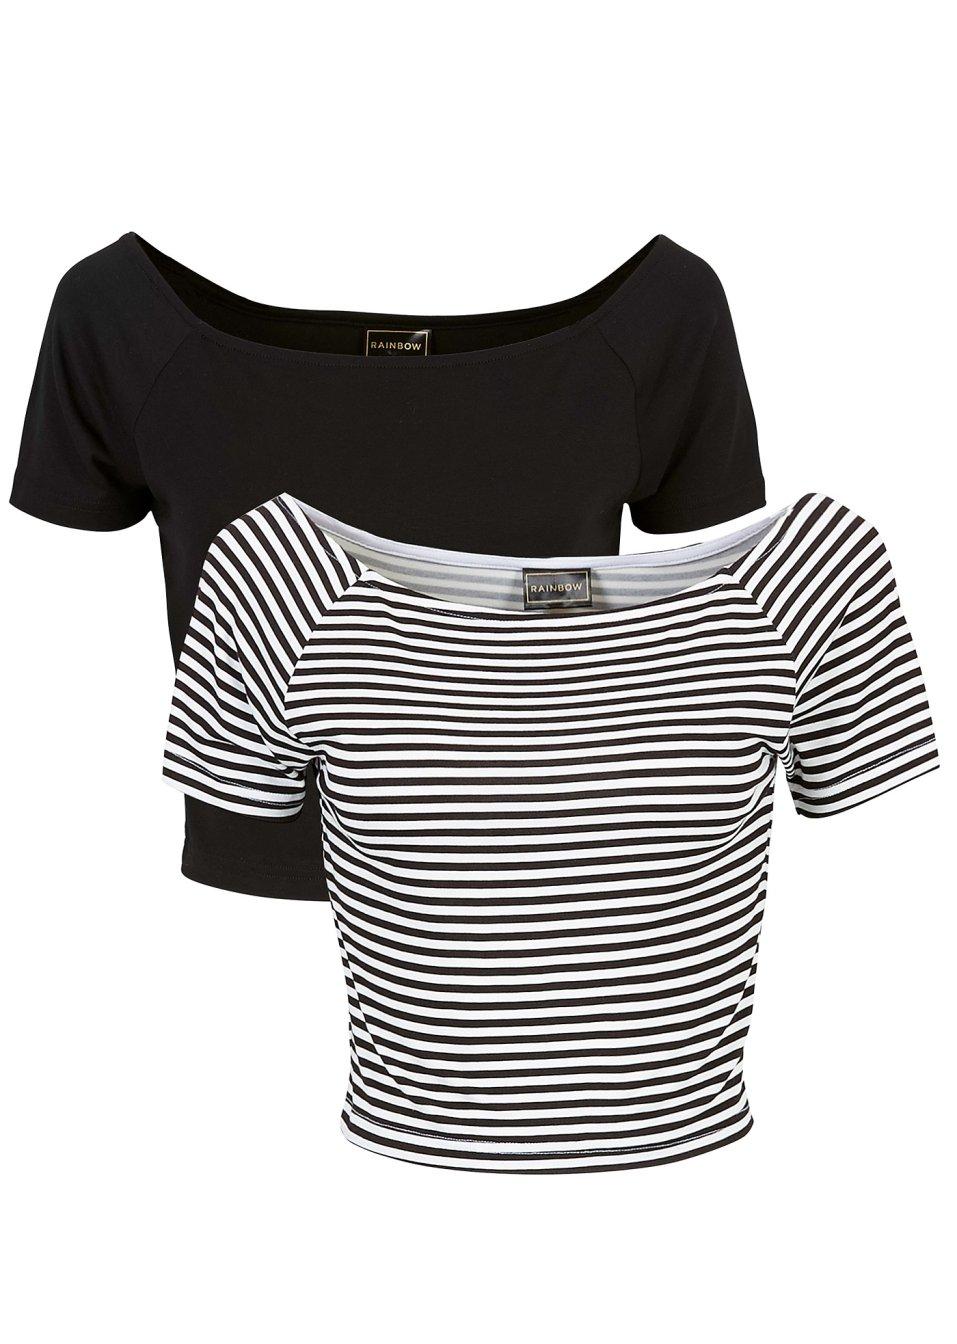 attraktives shirt mit carmen ausschnitt schwarz wei. Black Bedroom Furniture Sets. Home Design Ideas